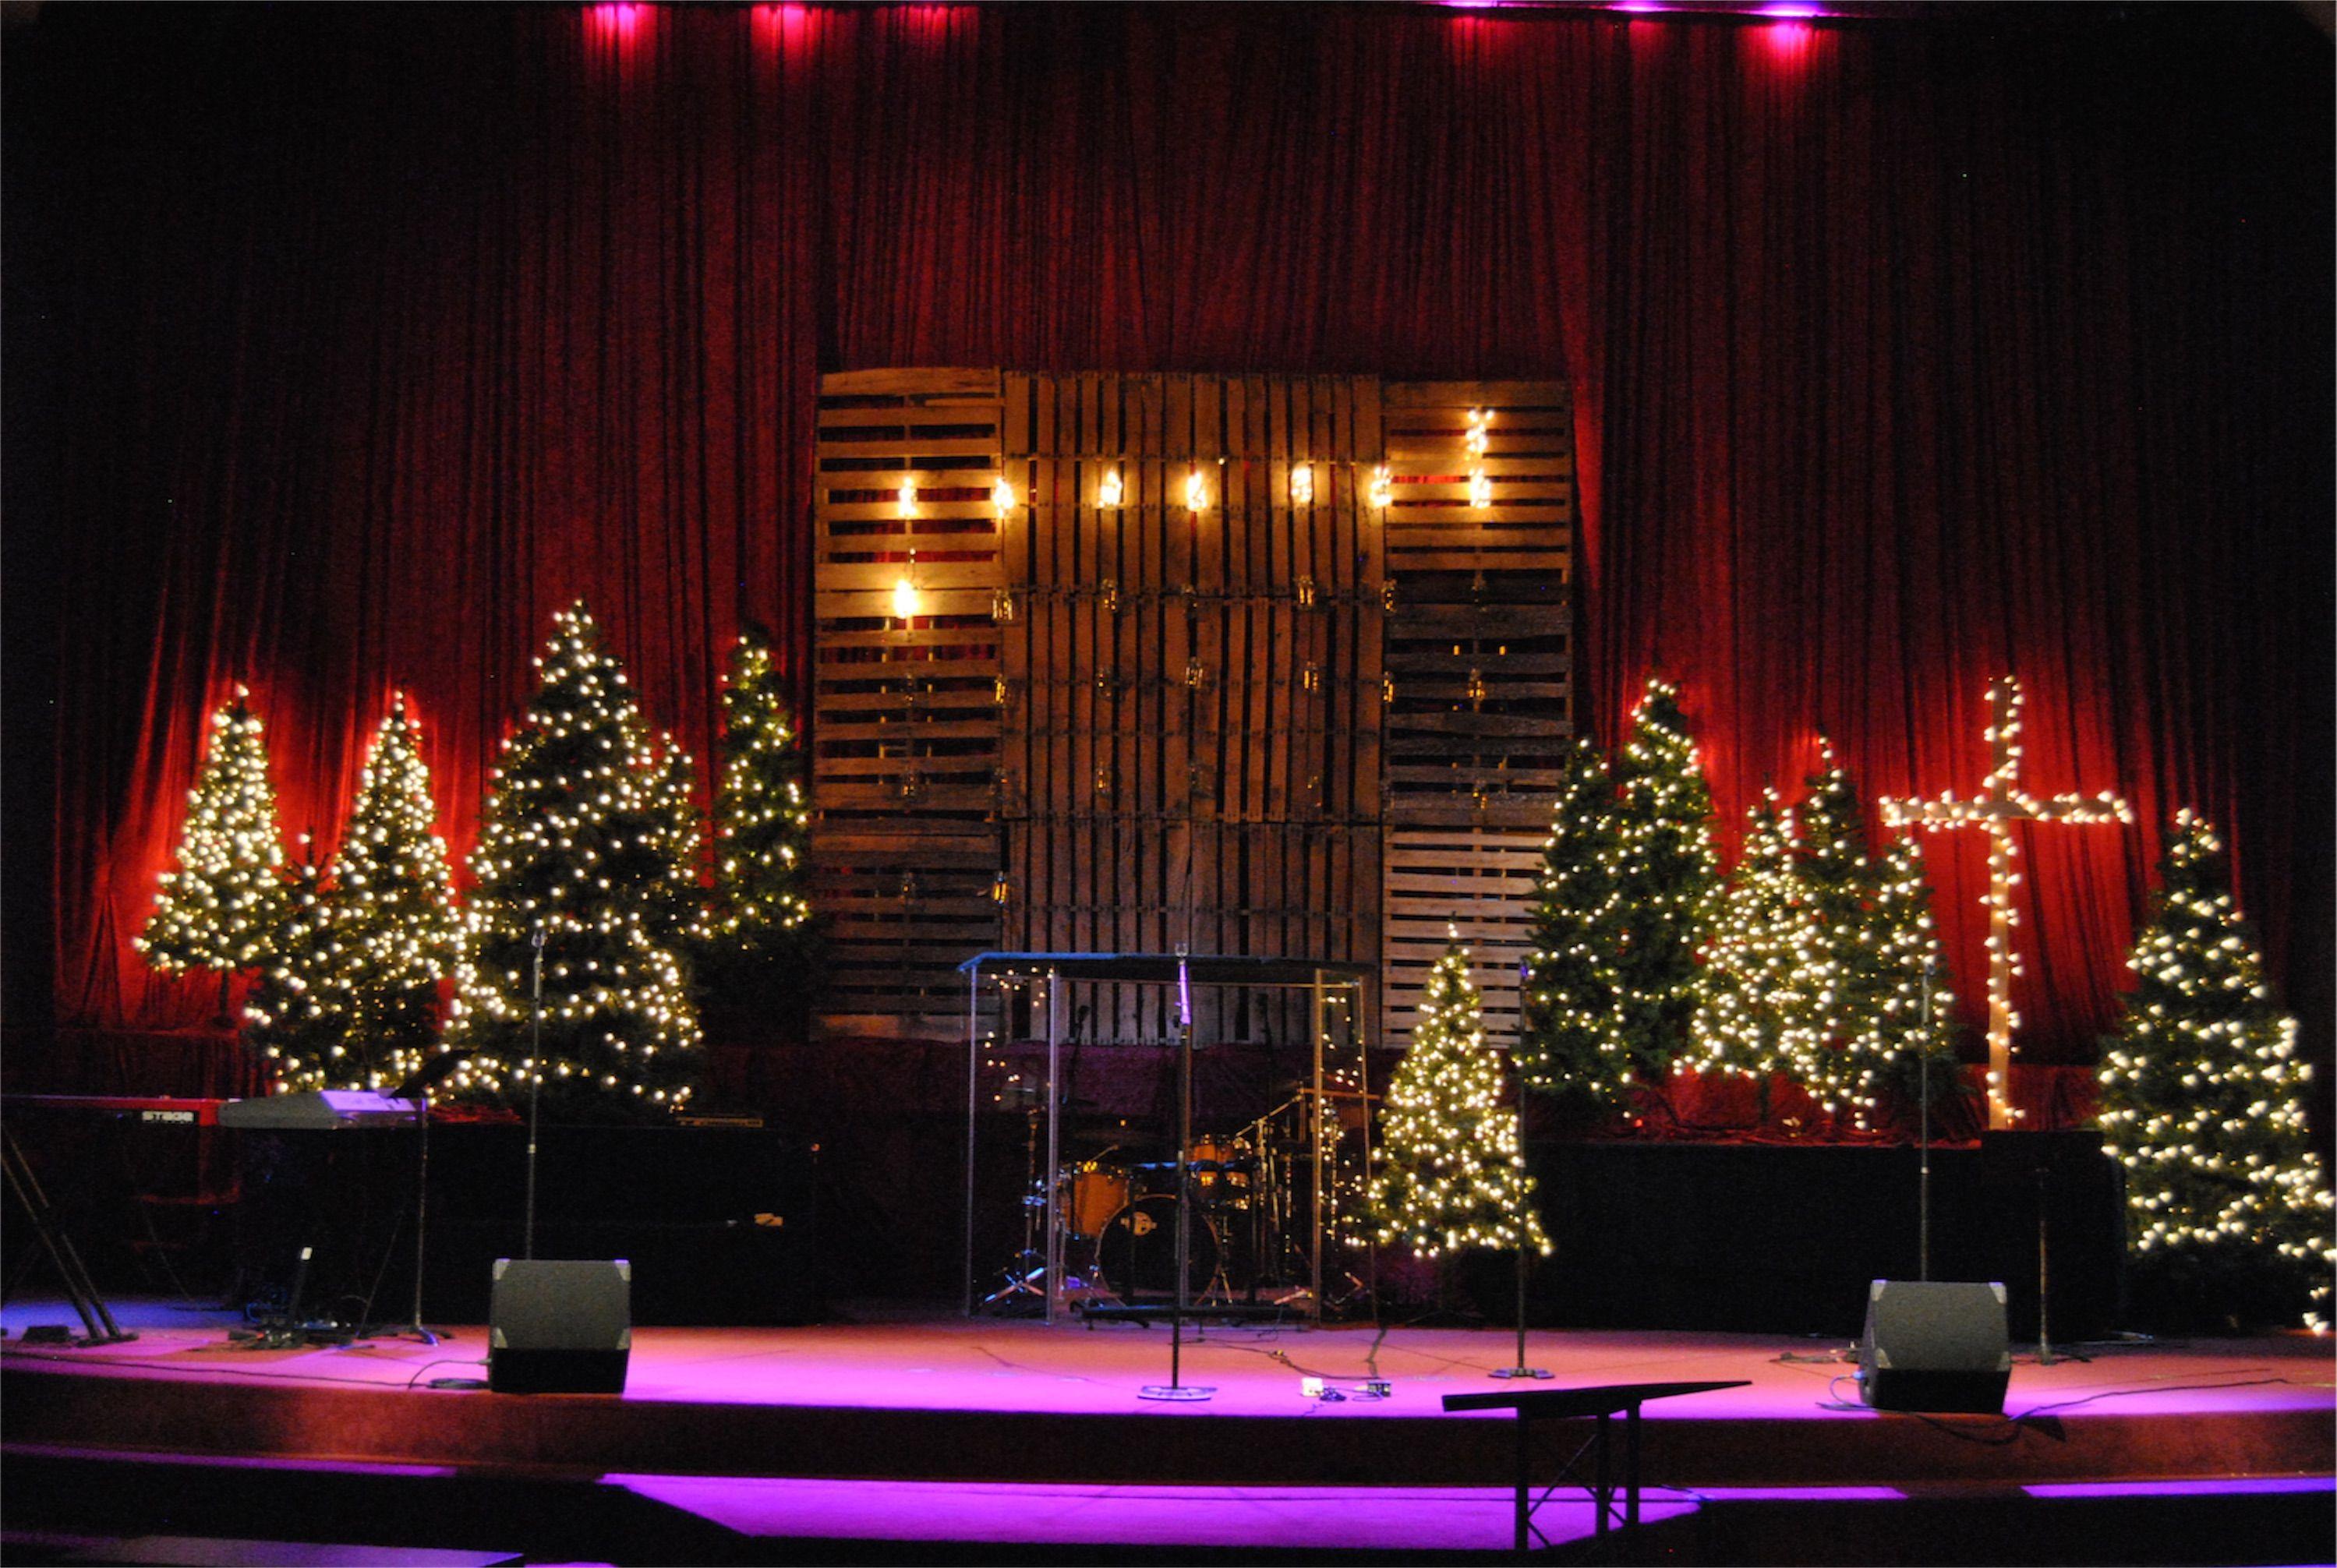 mason jar advent calendar church stage design ideas church pinterest church stage church stage design and stage design - Church Stage Design Ideas